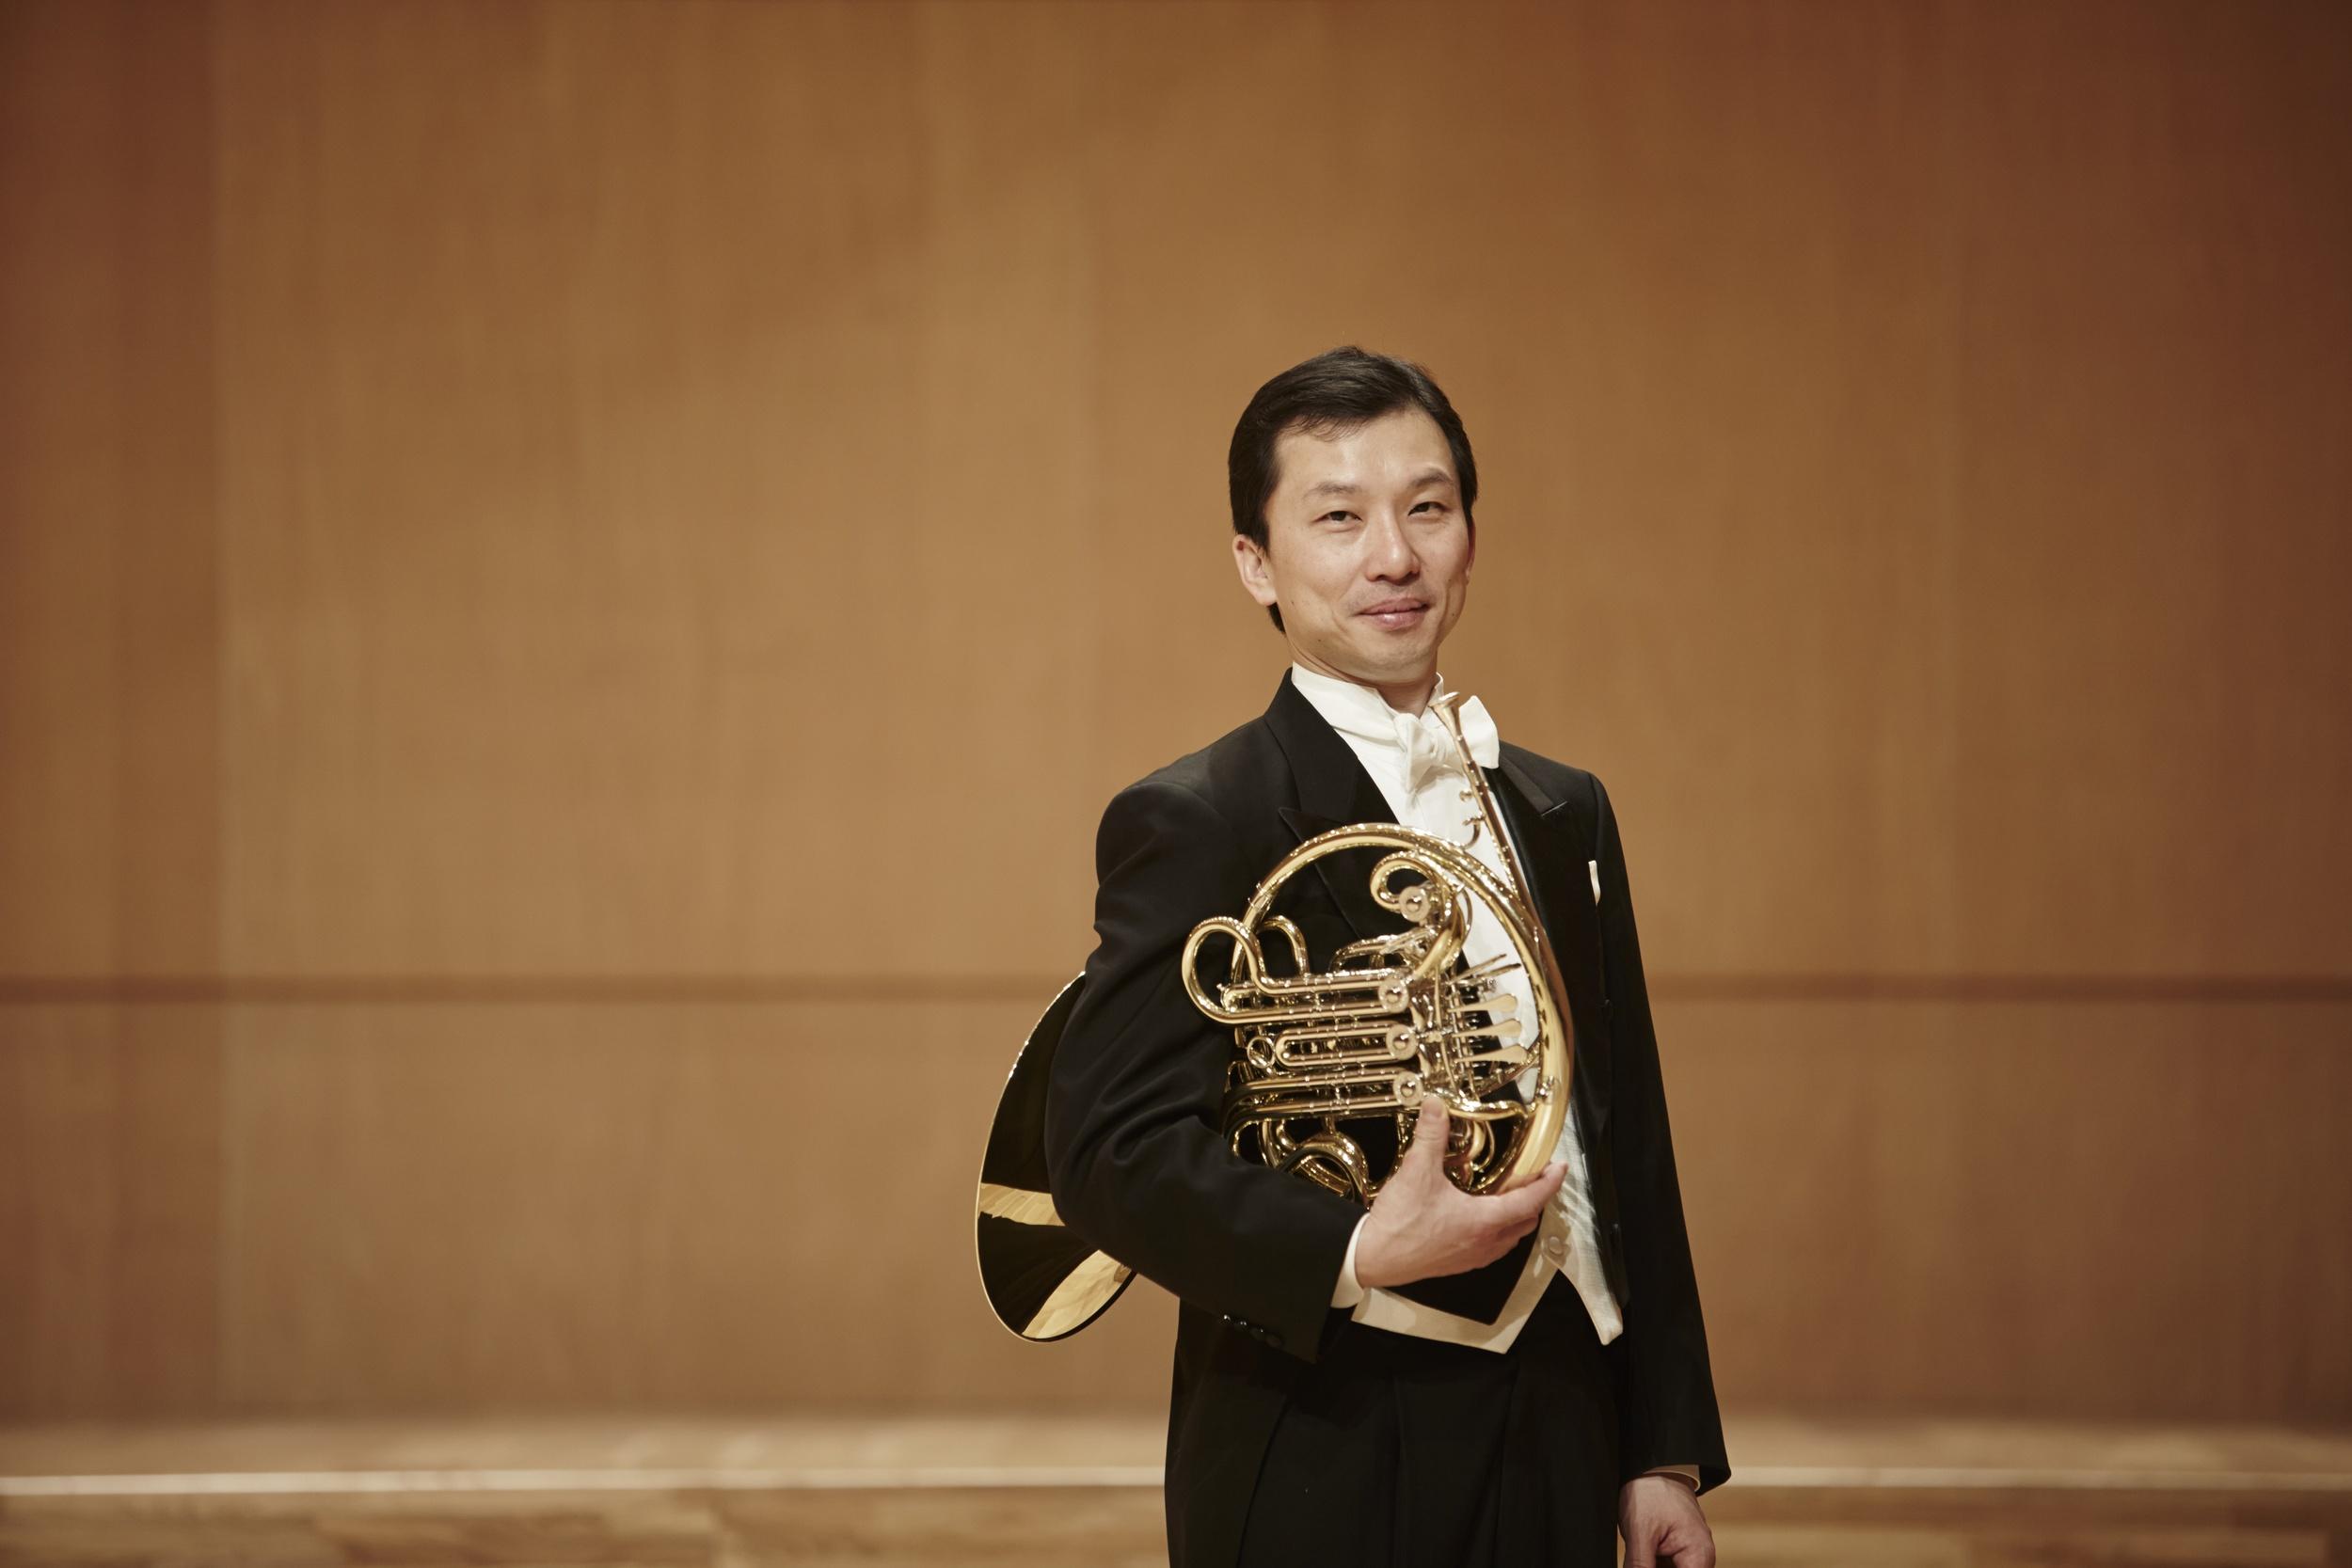 Takeshi Hidaka